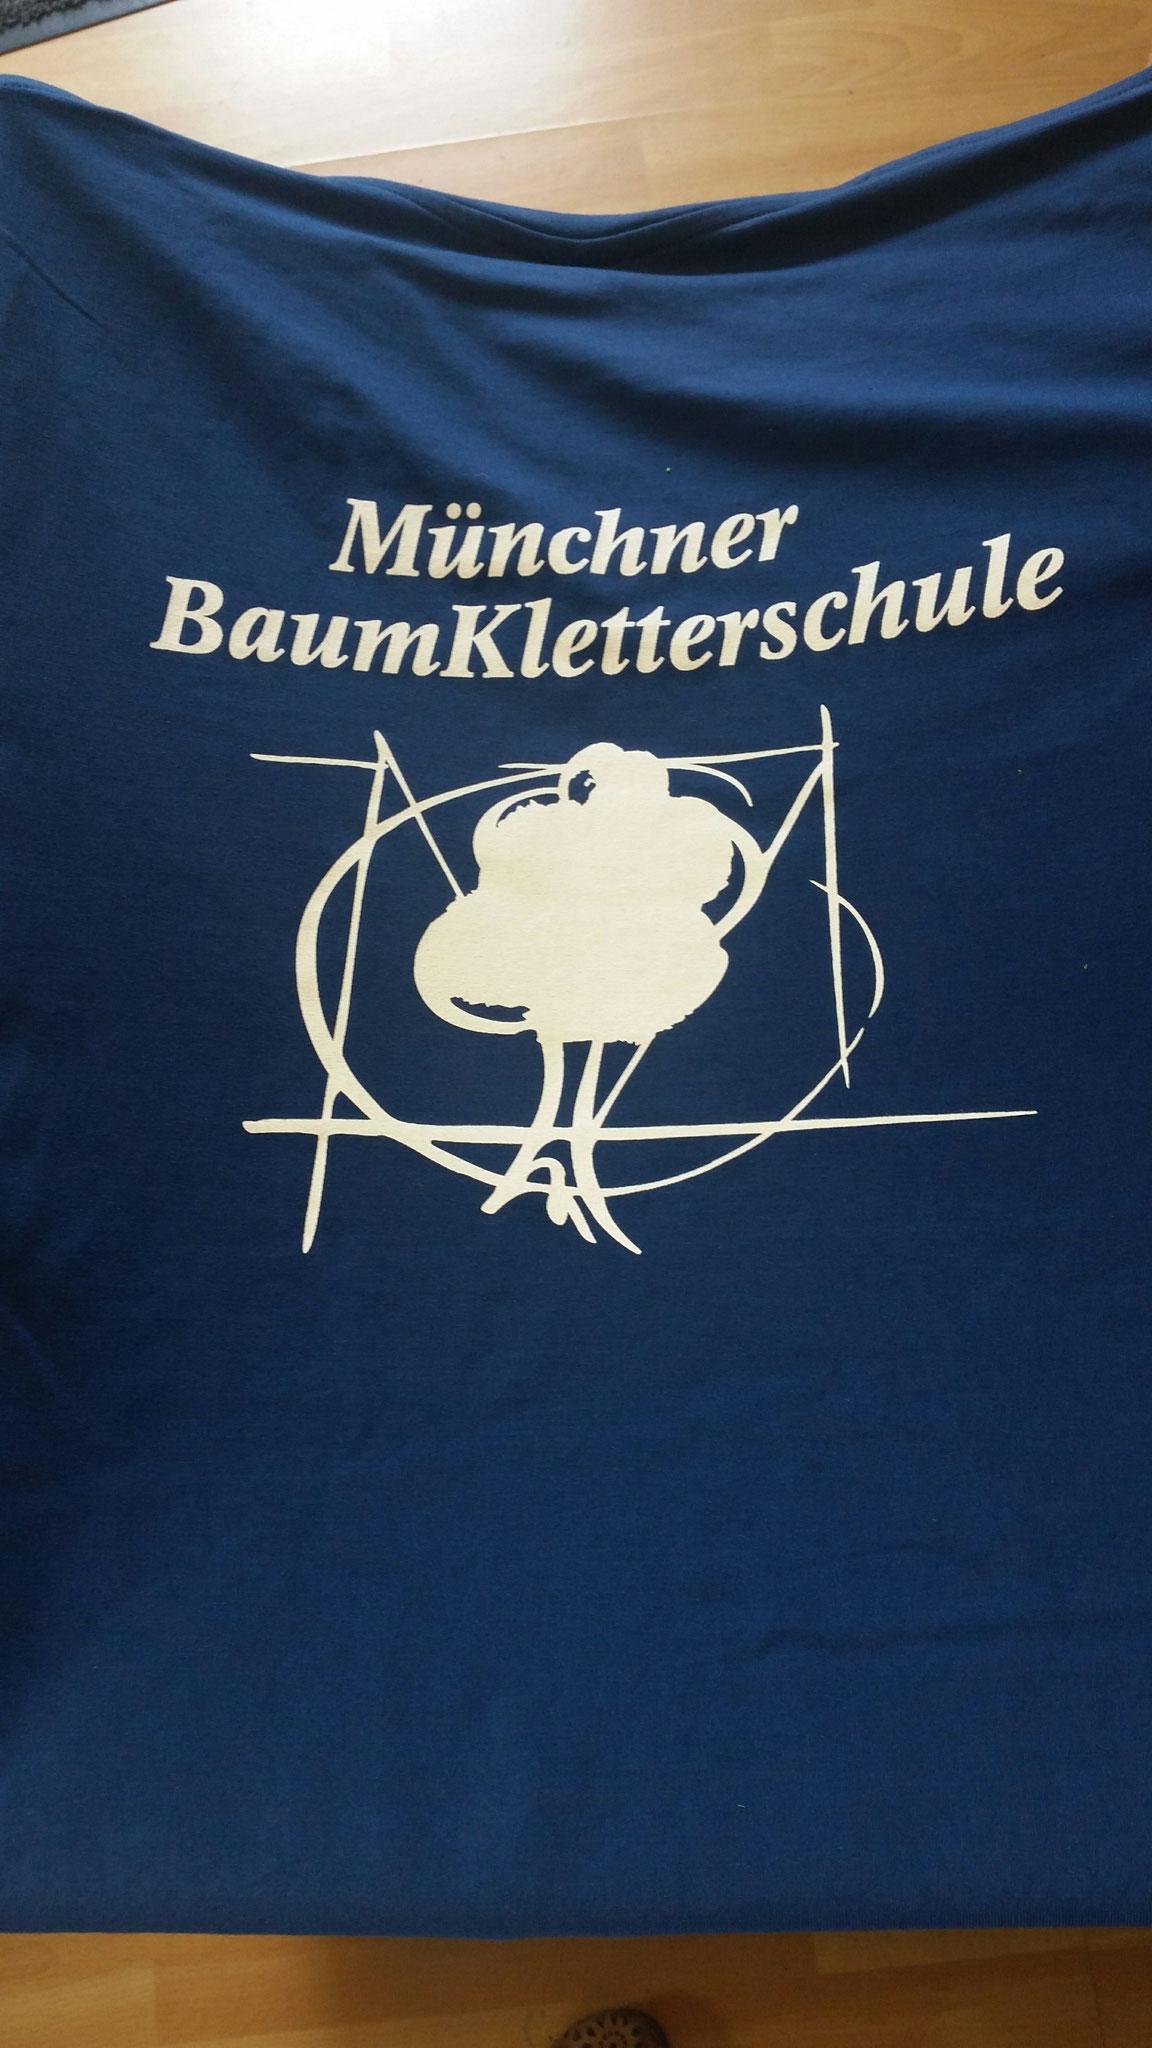 T-Shirt Siebdruck Rücken 1-farbig